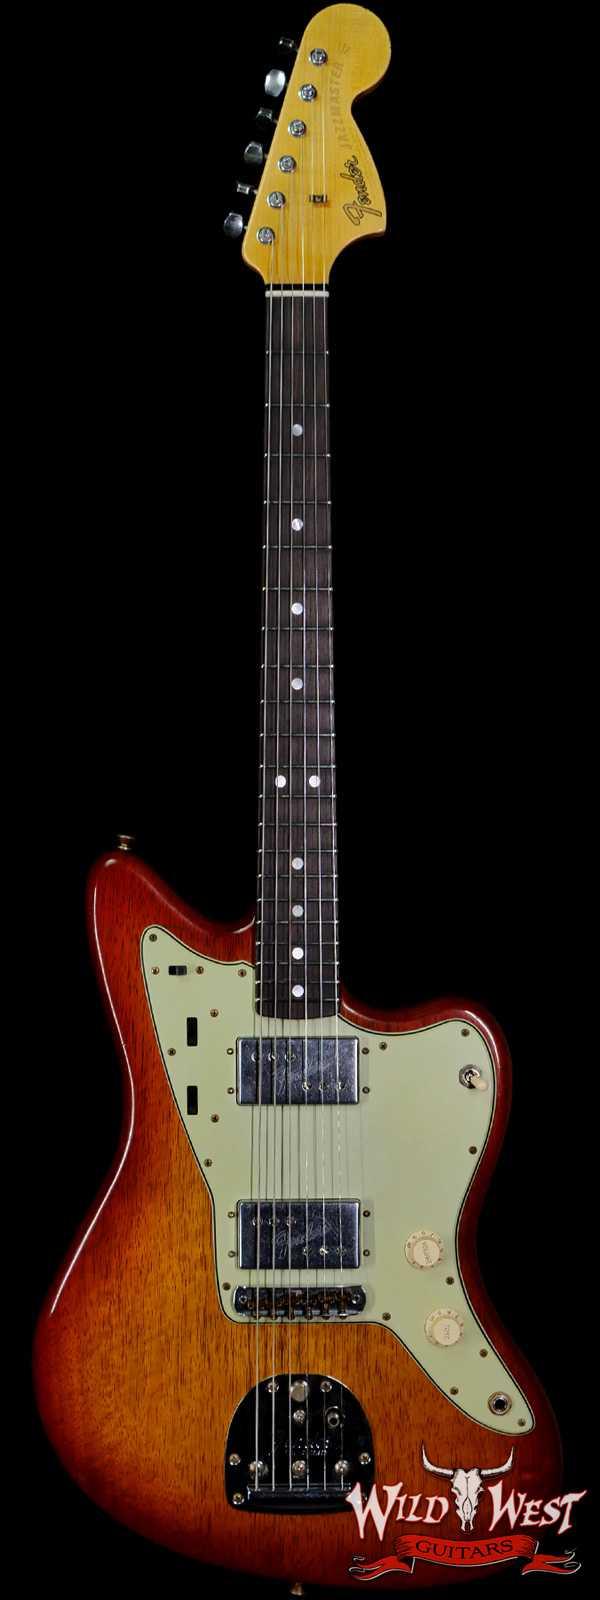 Fender Custom Shop Ron Thorn Masterbuilt 70's Korina Jazzmaster Journeyman Relic Tobacco Sunburst